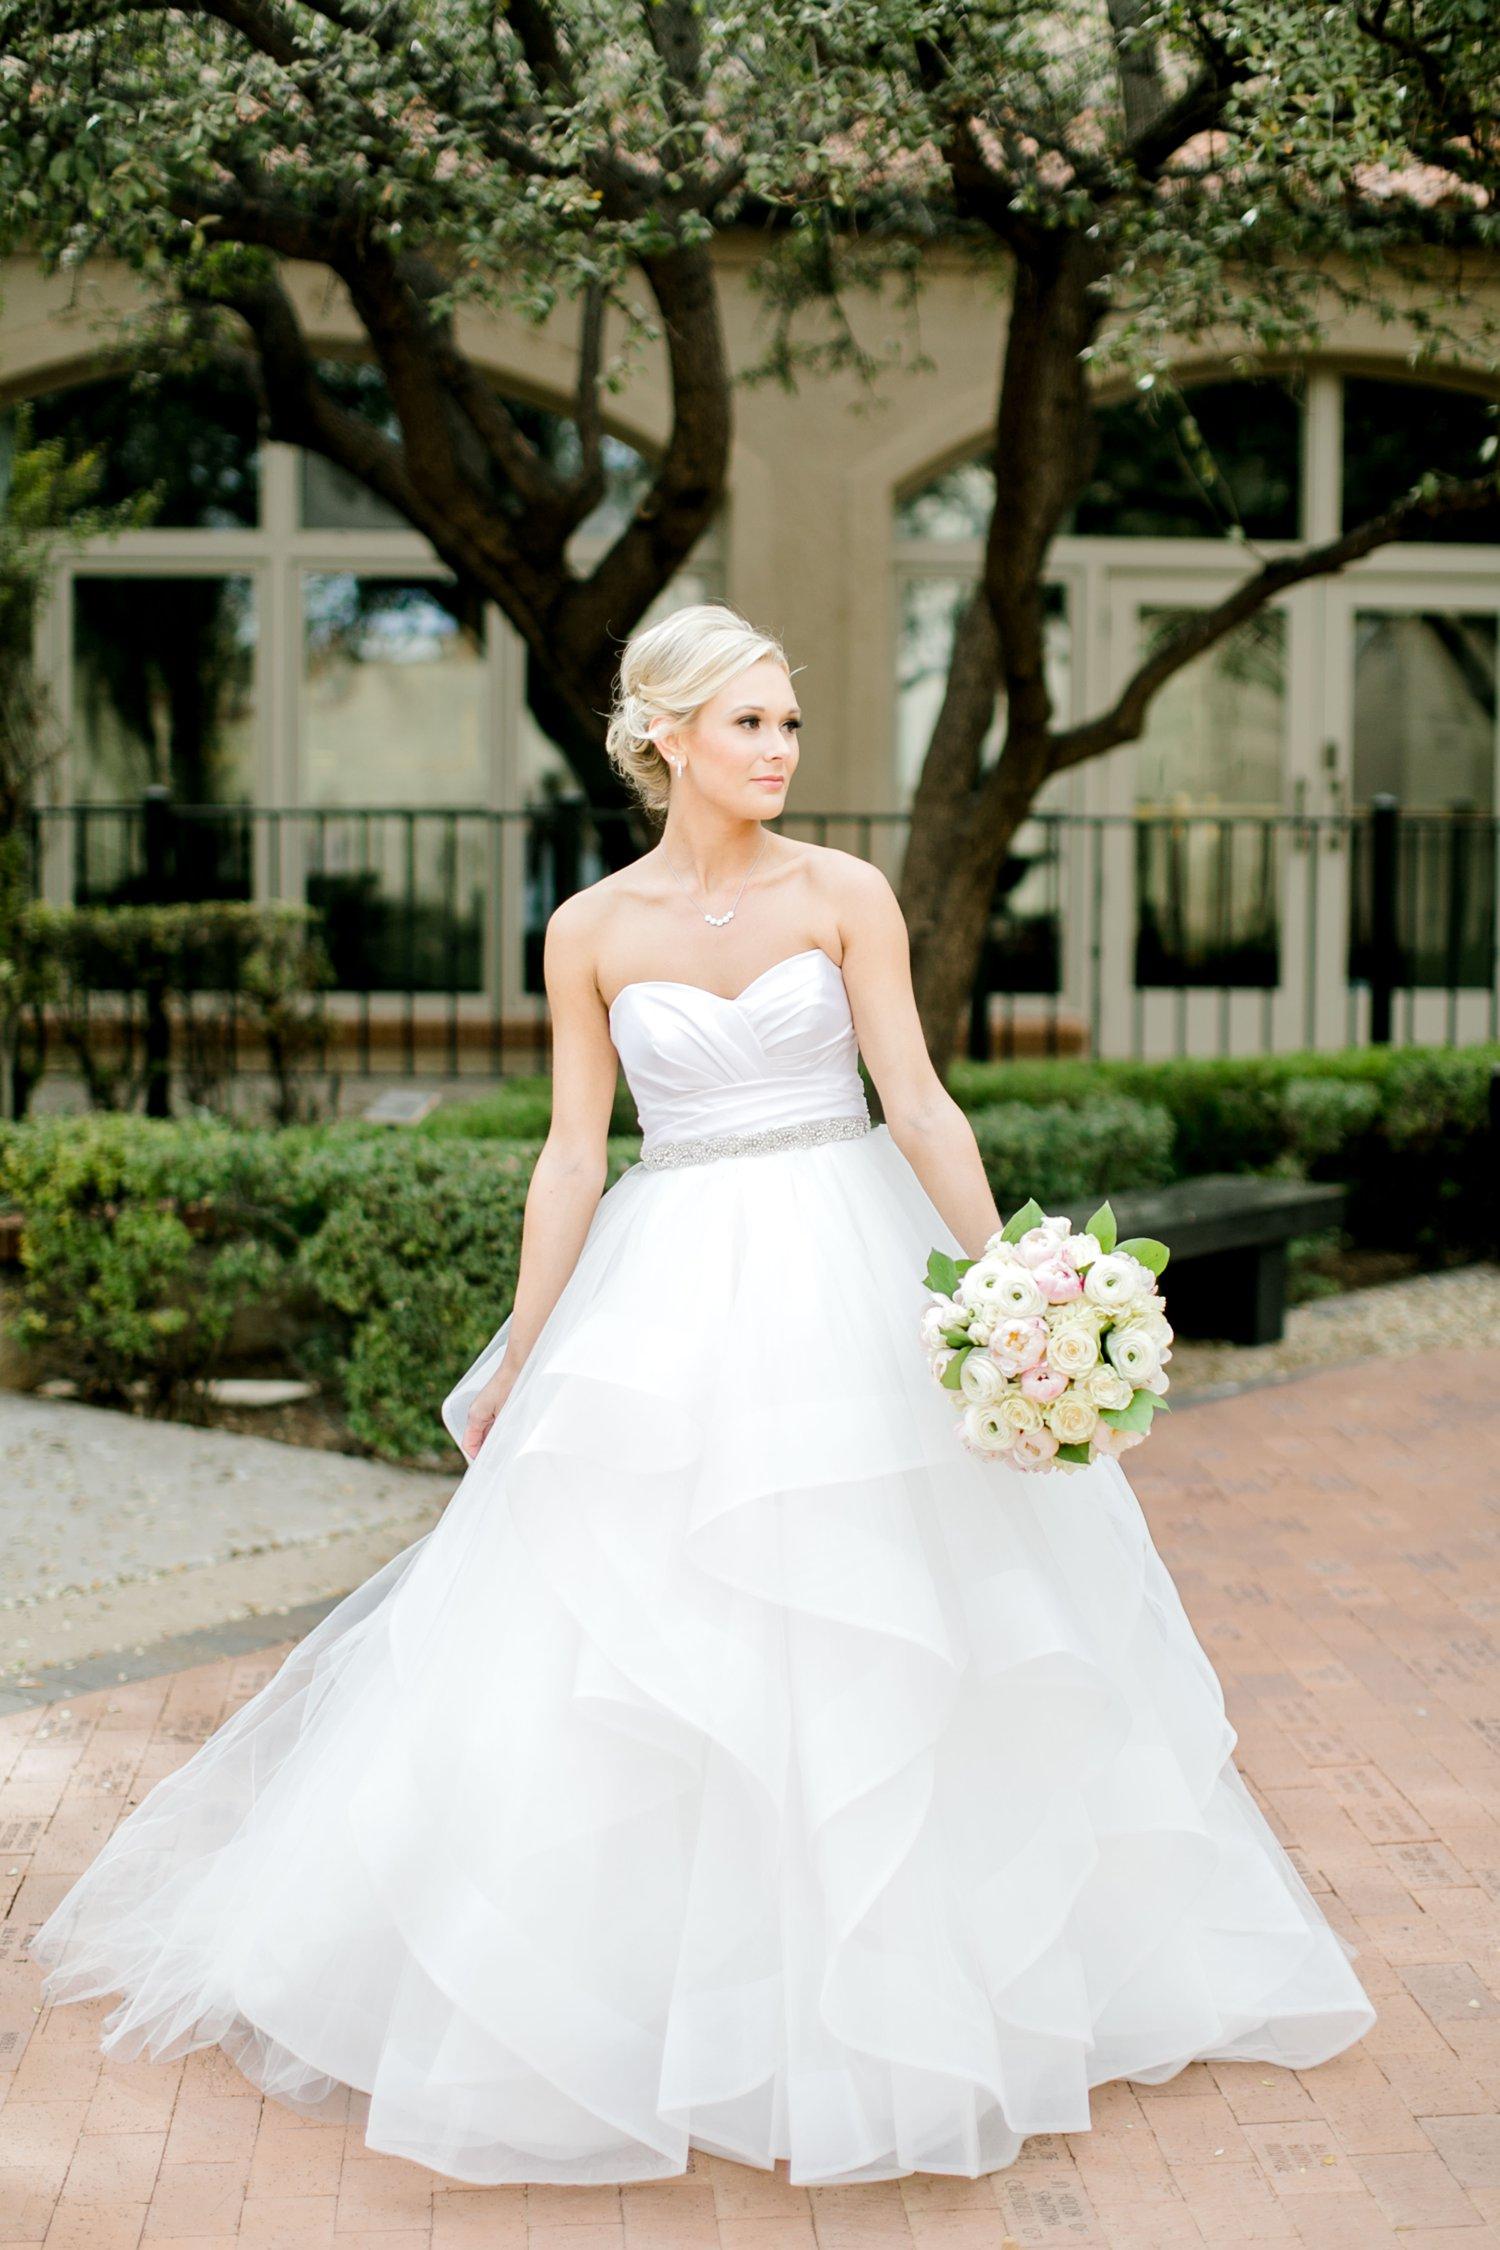 Taylor-Williams-Merket-Alumni-Center-Texas-Tech-Weddings-Lubbock-Photographer_0002.jpg